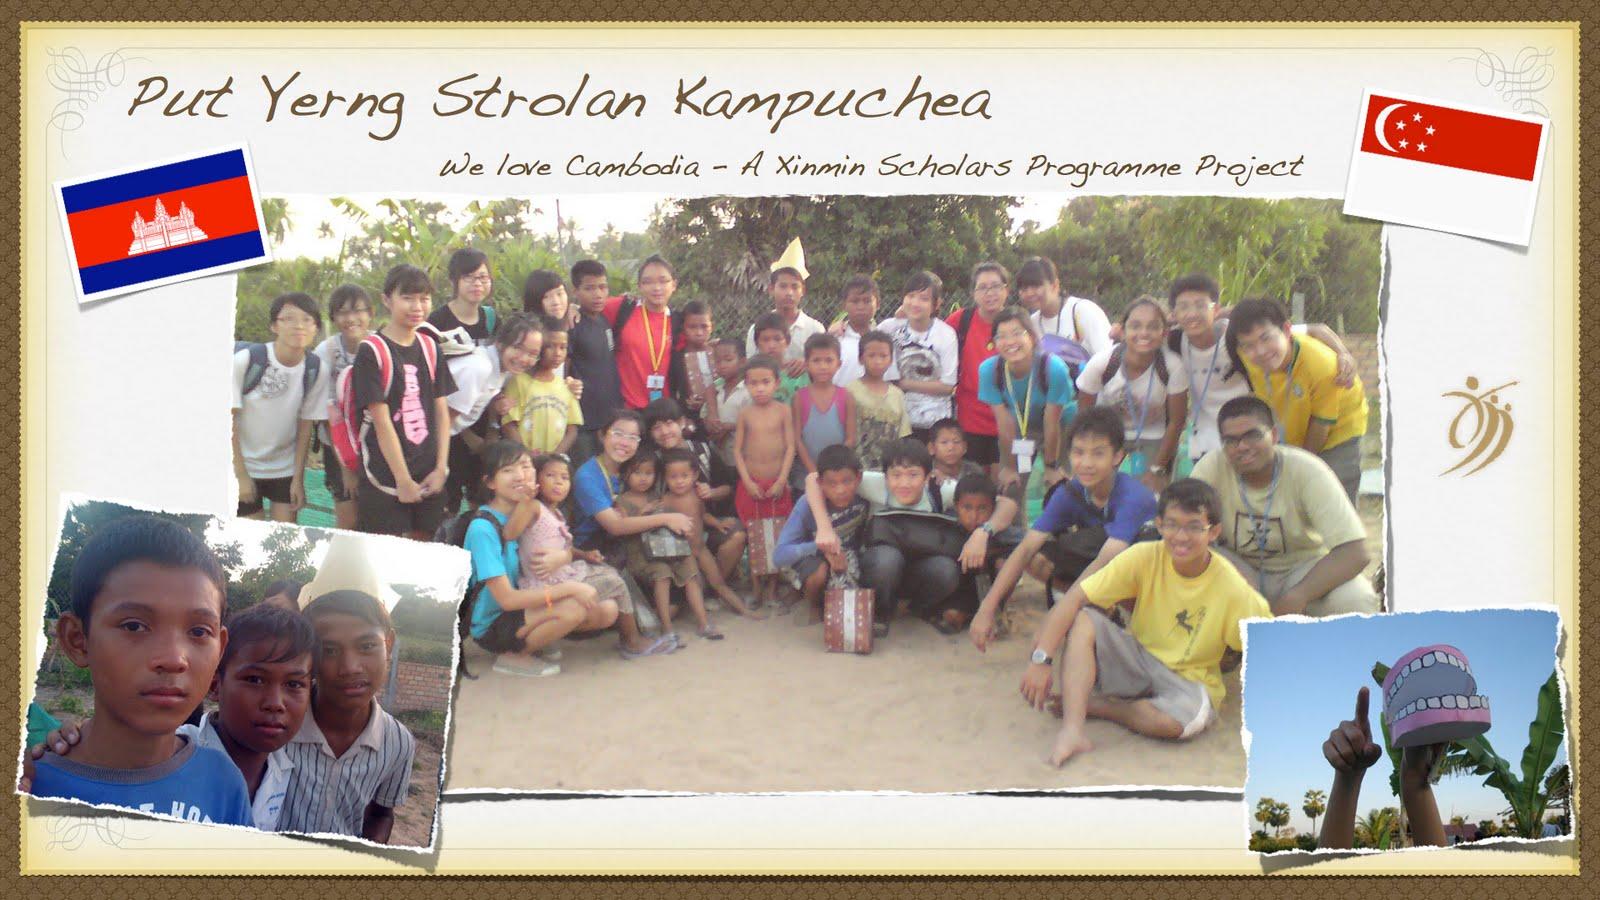 Put Yerng Strolan Kampuchea